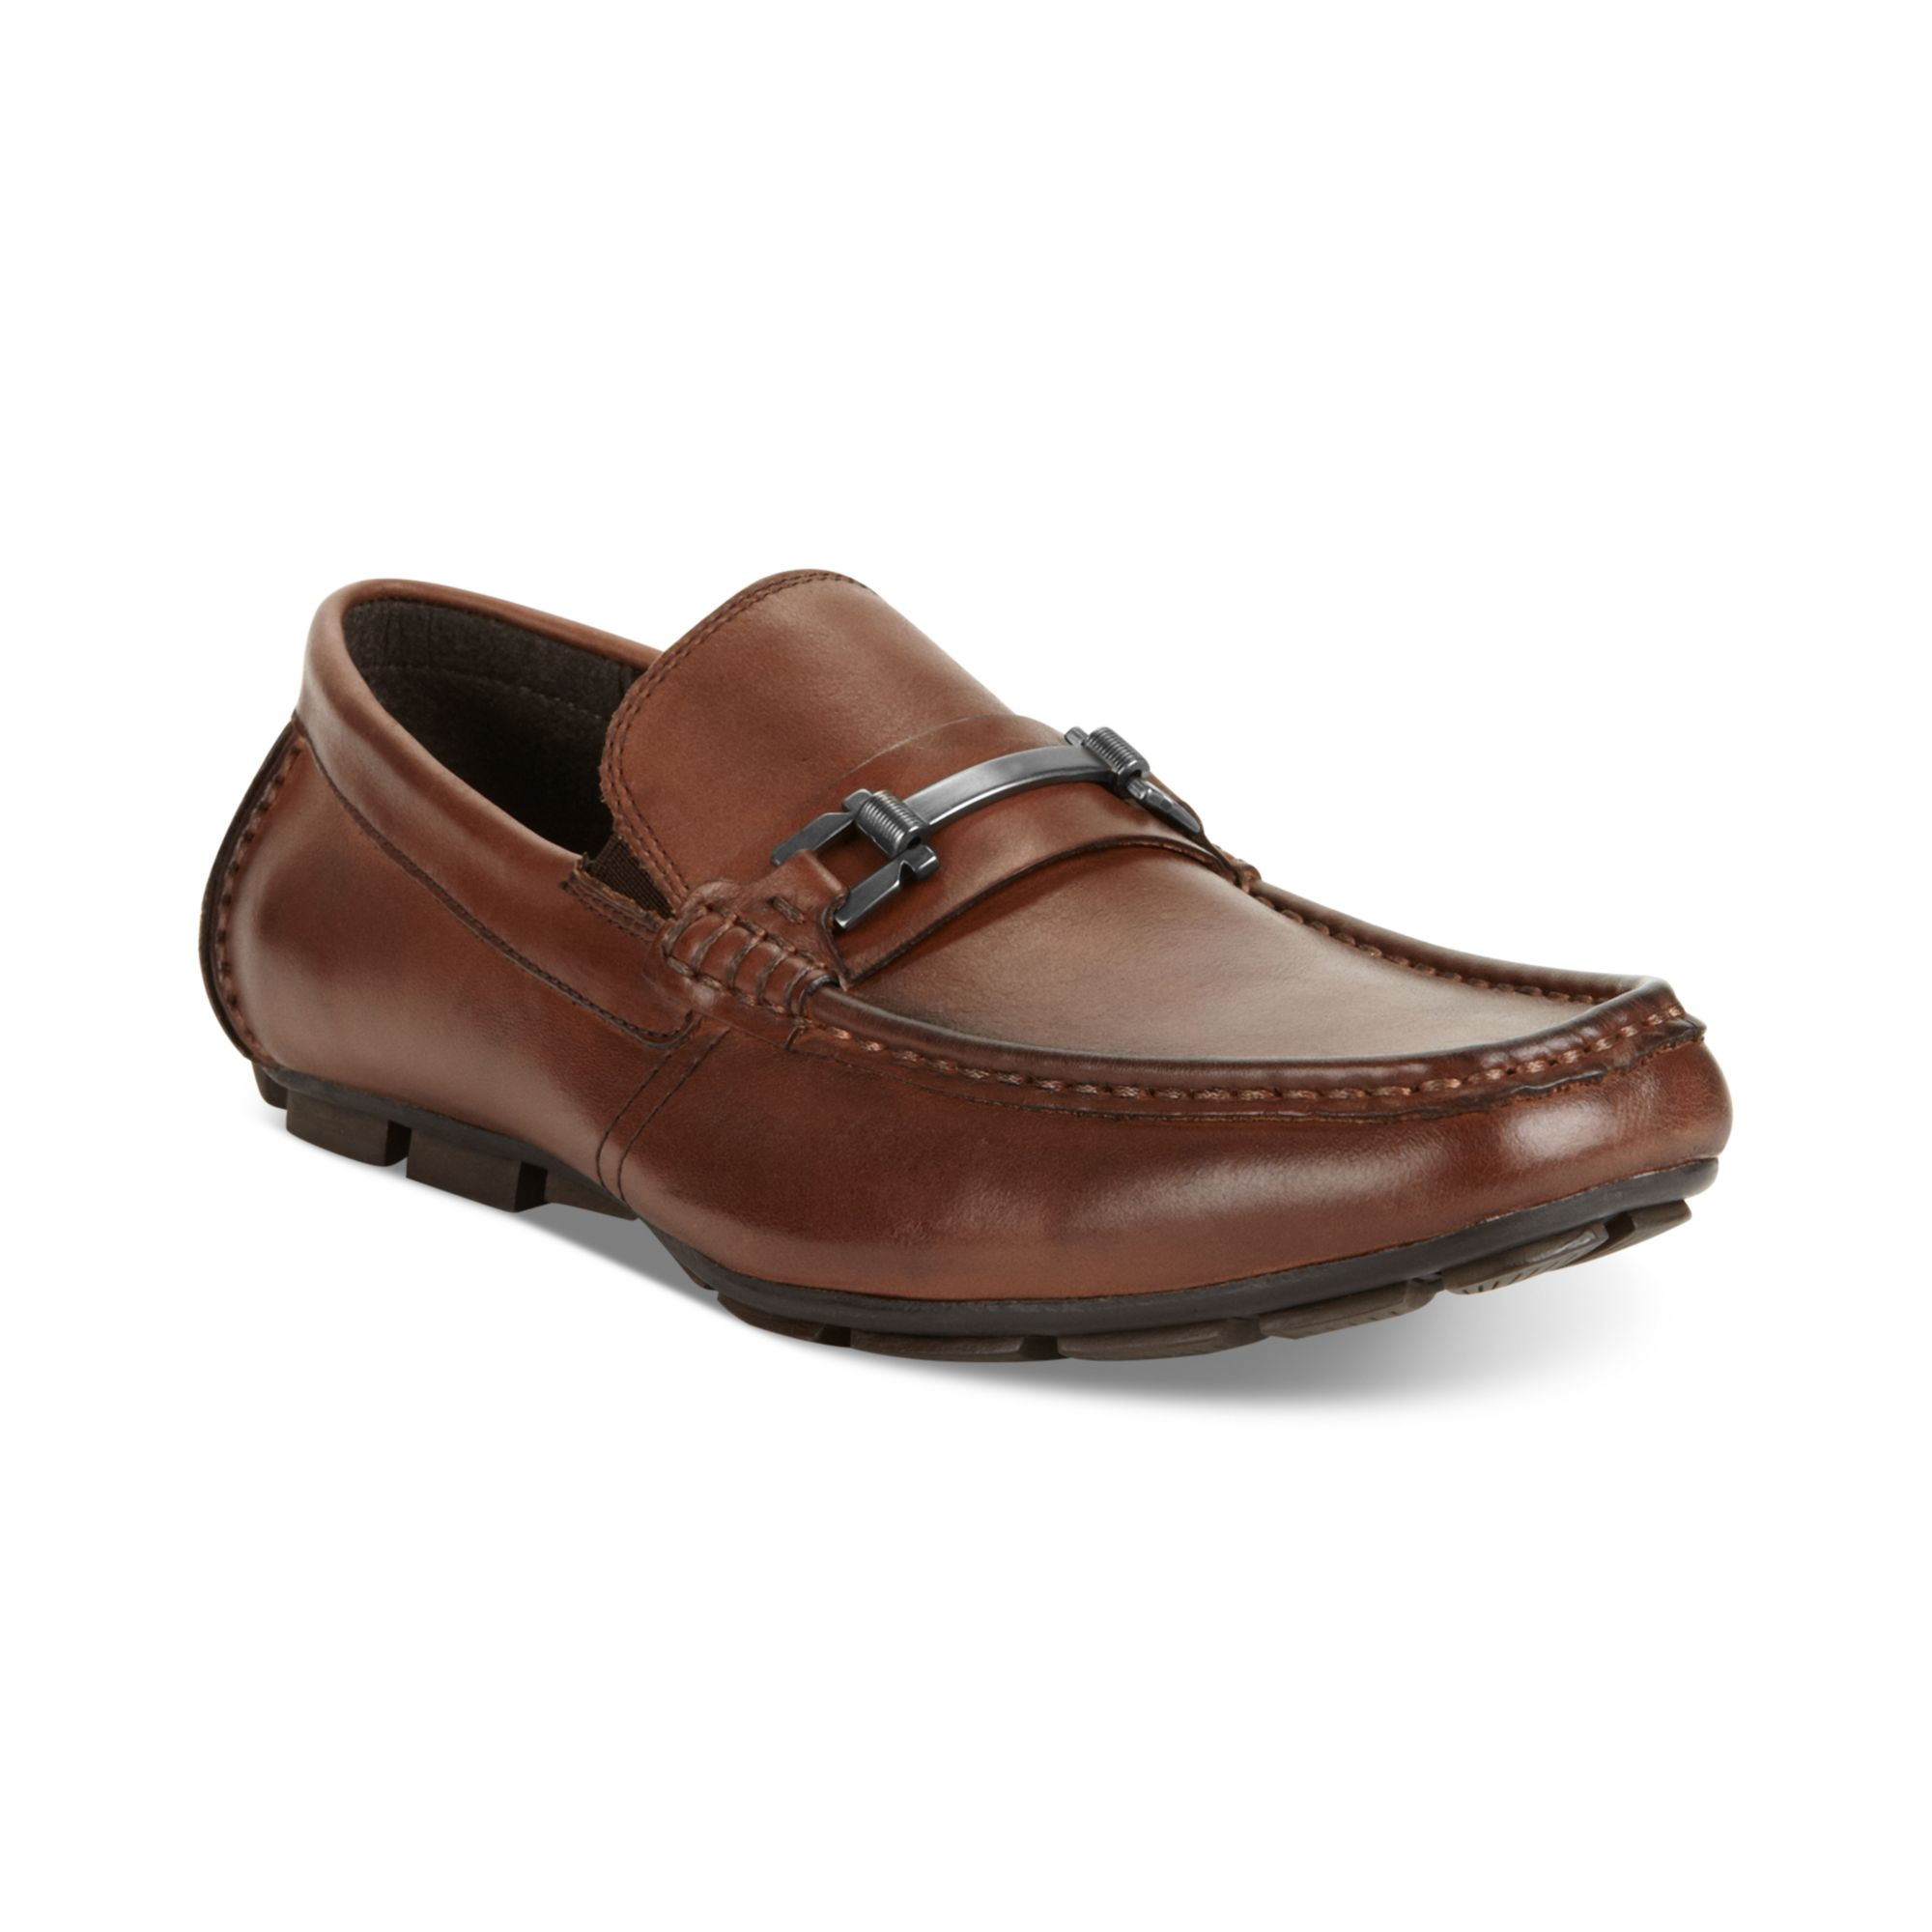 Kenneth Cole Reaction Shoe Sizing